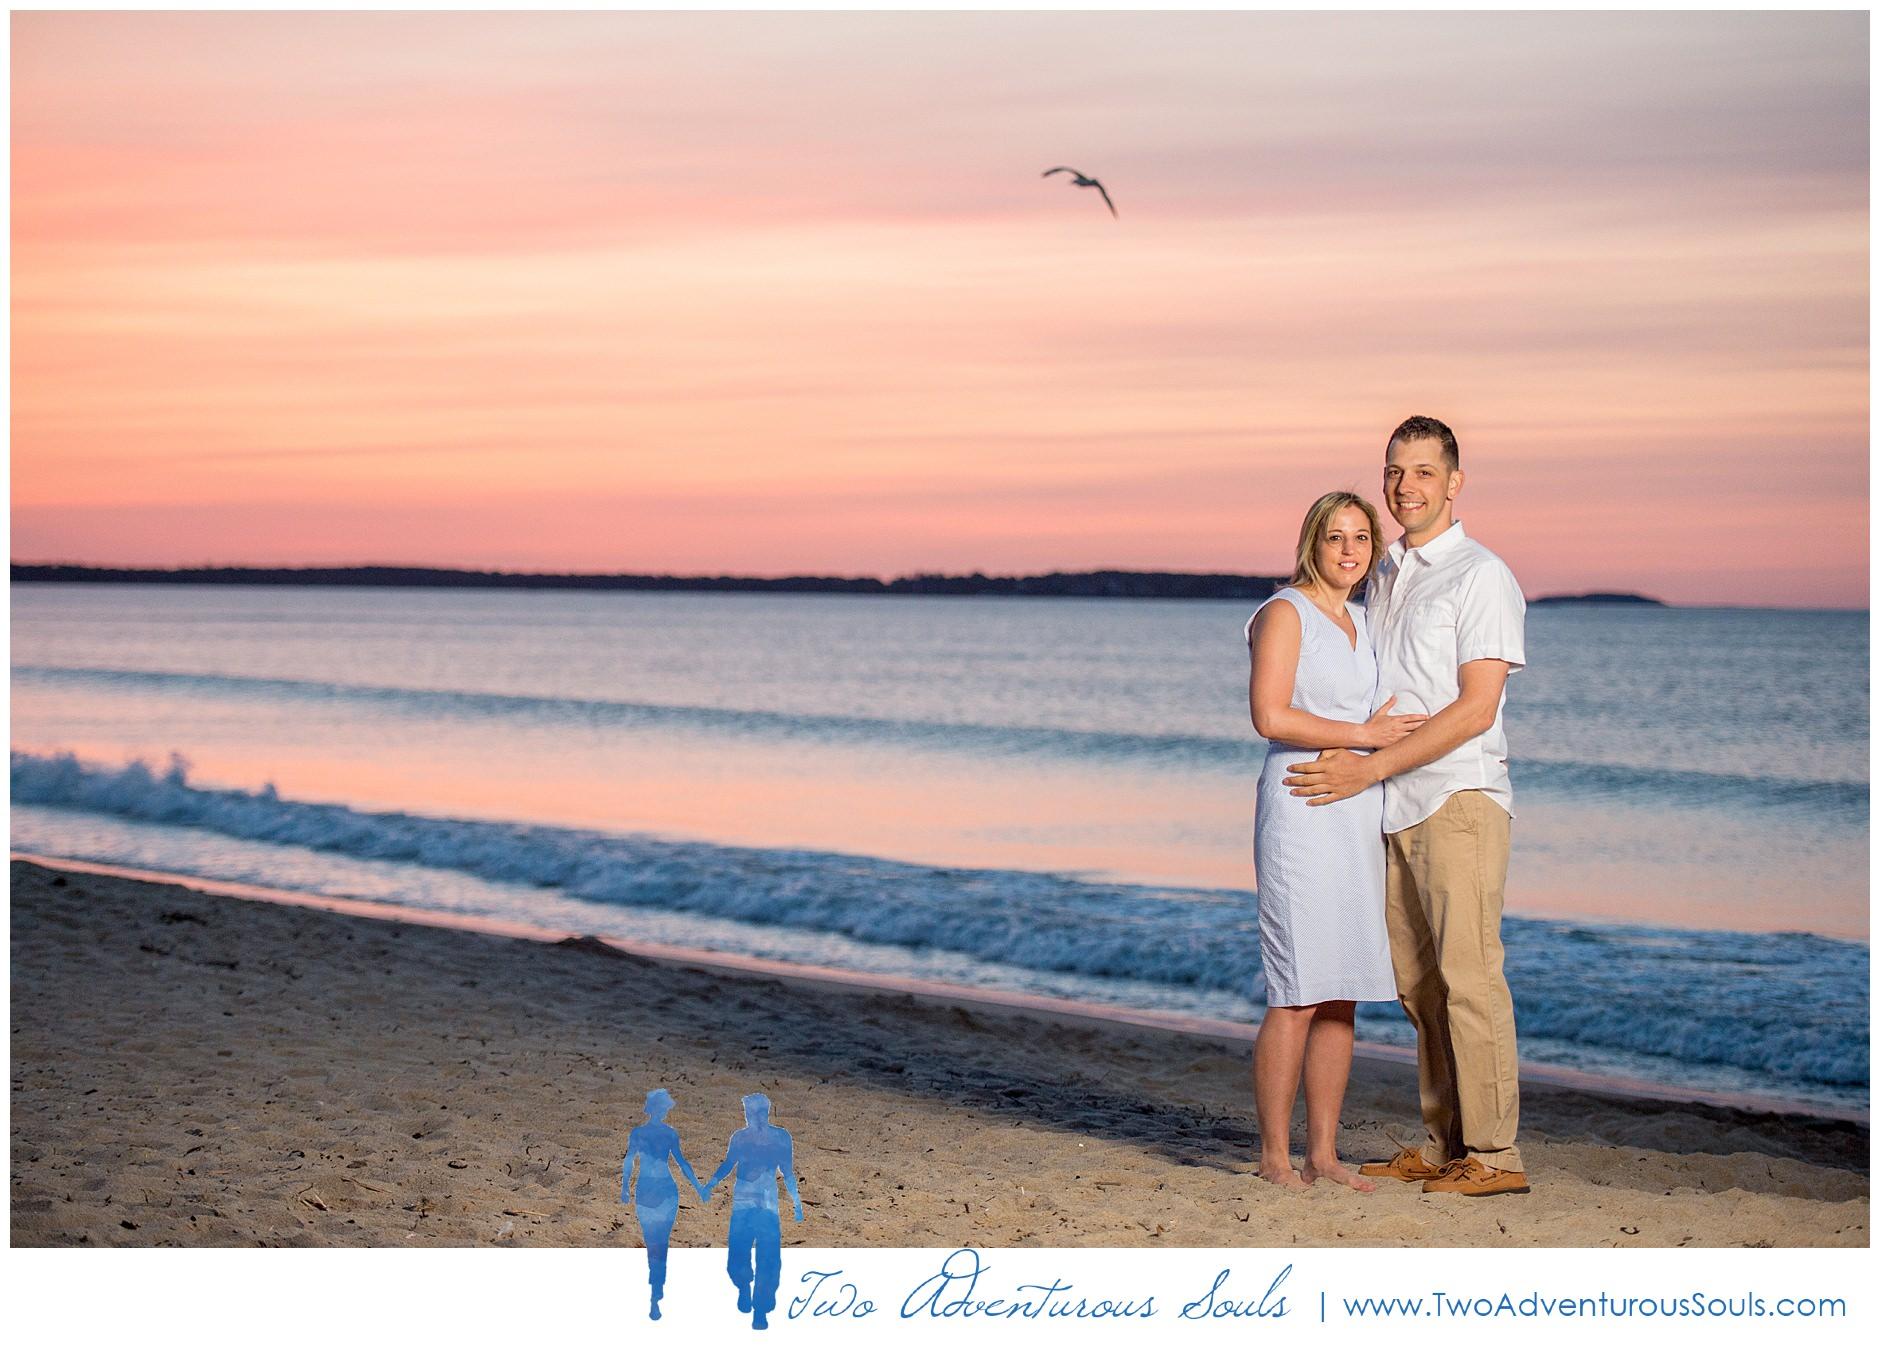 Maine Wedding Photographers, Connecticut Wedding Photographers, Old Orchard Beach Wedding Photographers, Two Adventurous Souls-JustinElise_0001.jpg